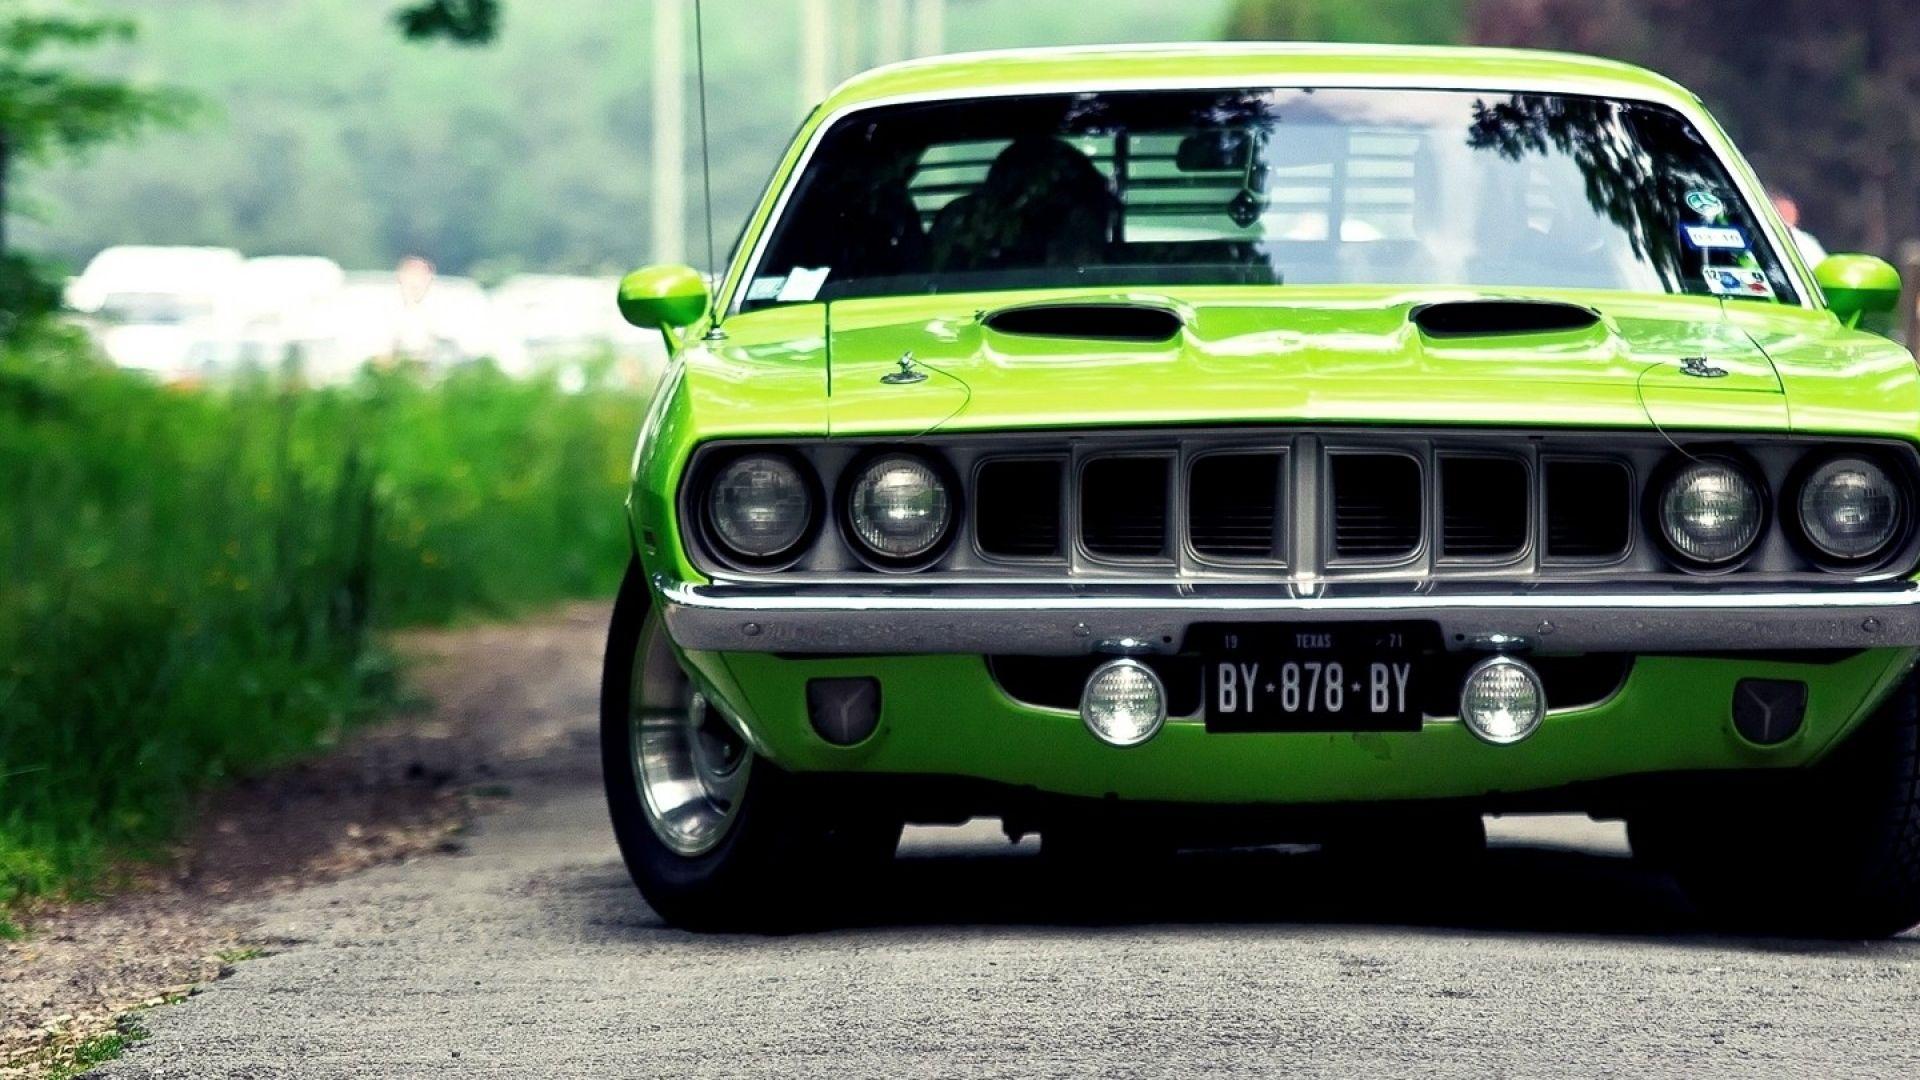 Dodge Cars List >> Mopar Muscle Car Wallpaper - WallpaperSafari